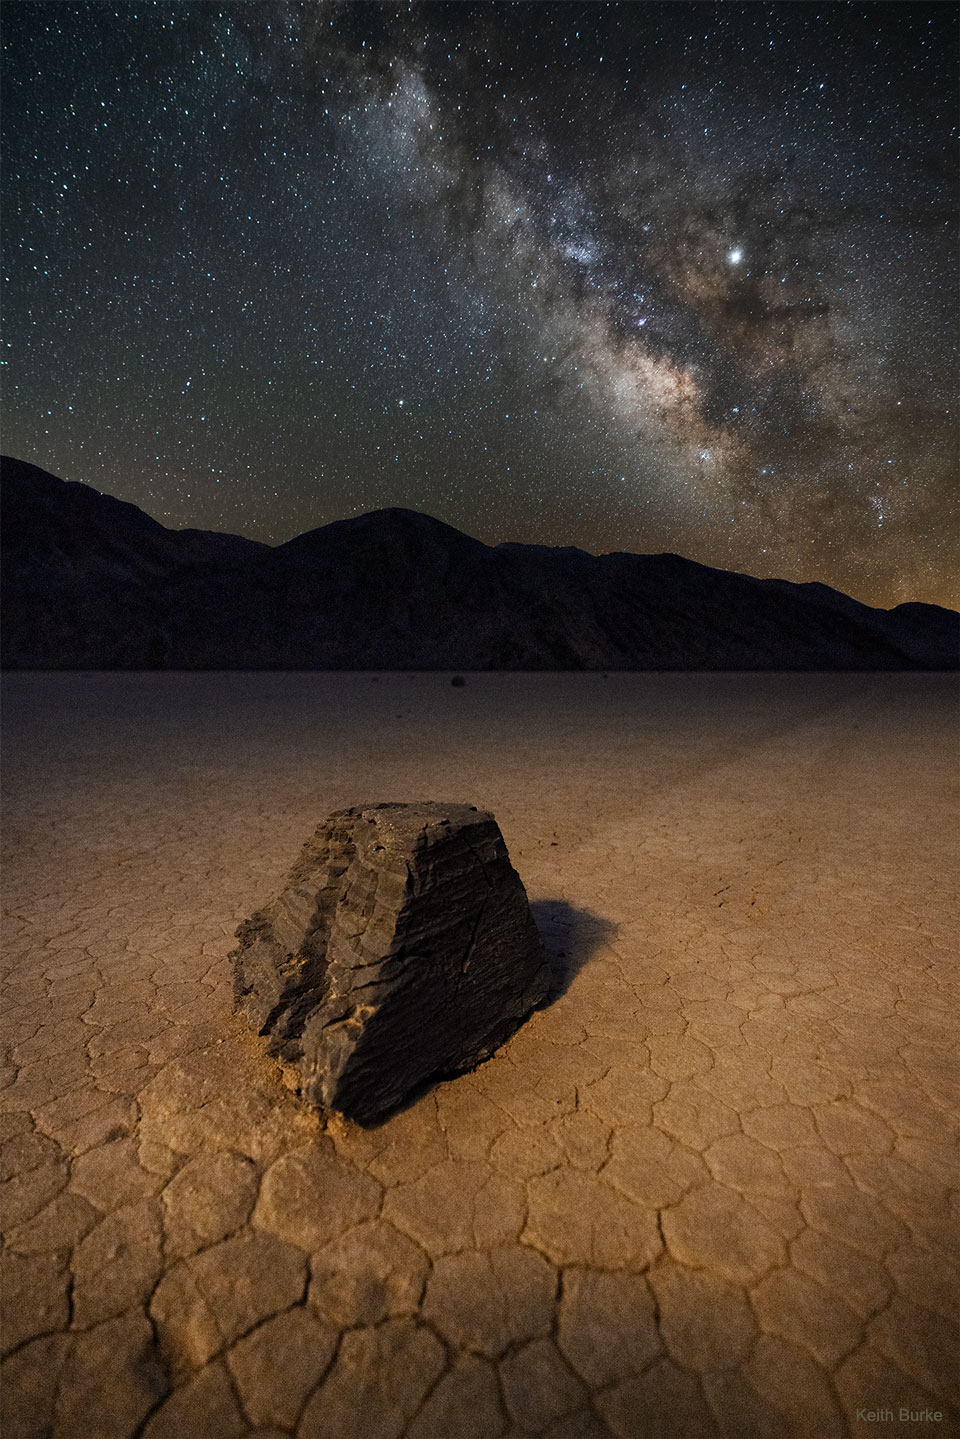 Les pierres glissantes de la Vallée de la Mort